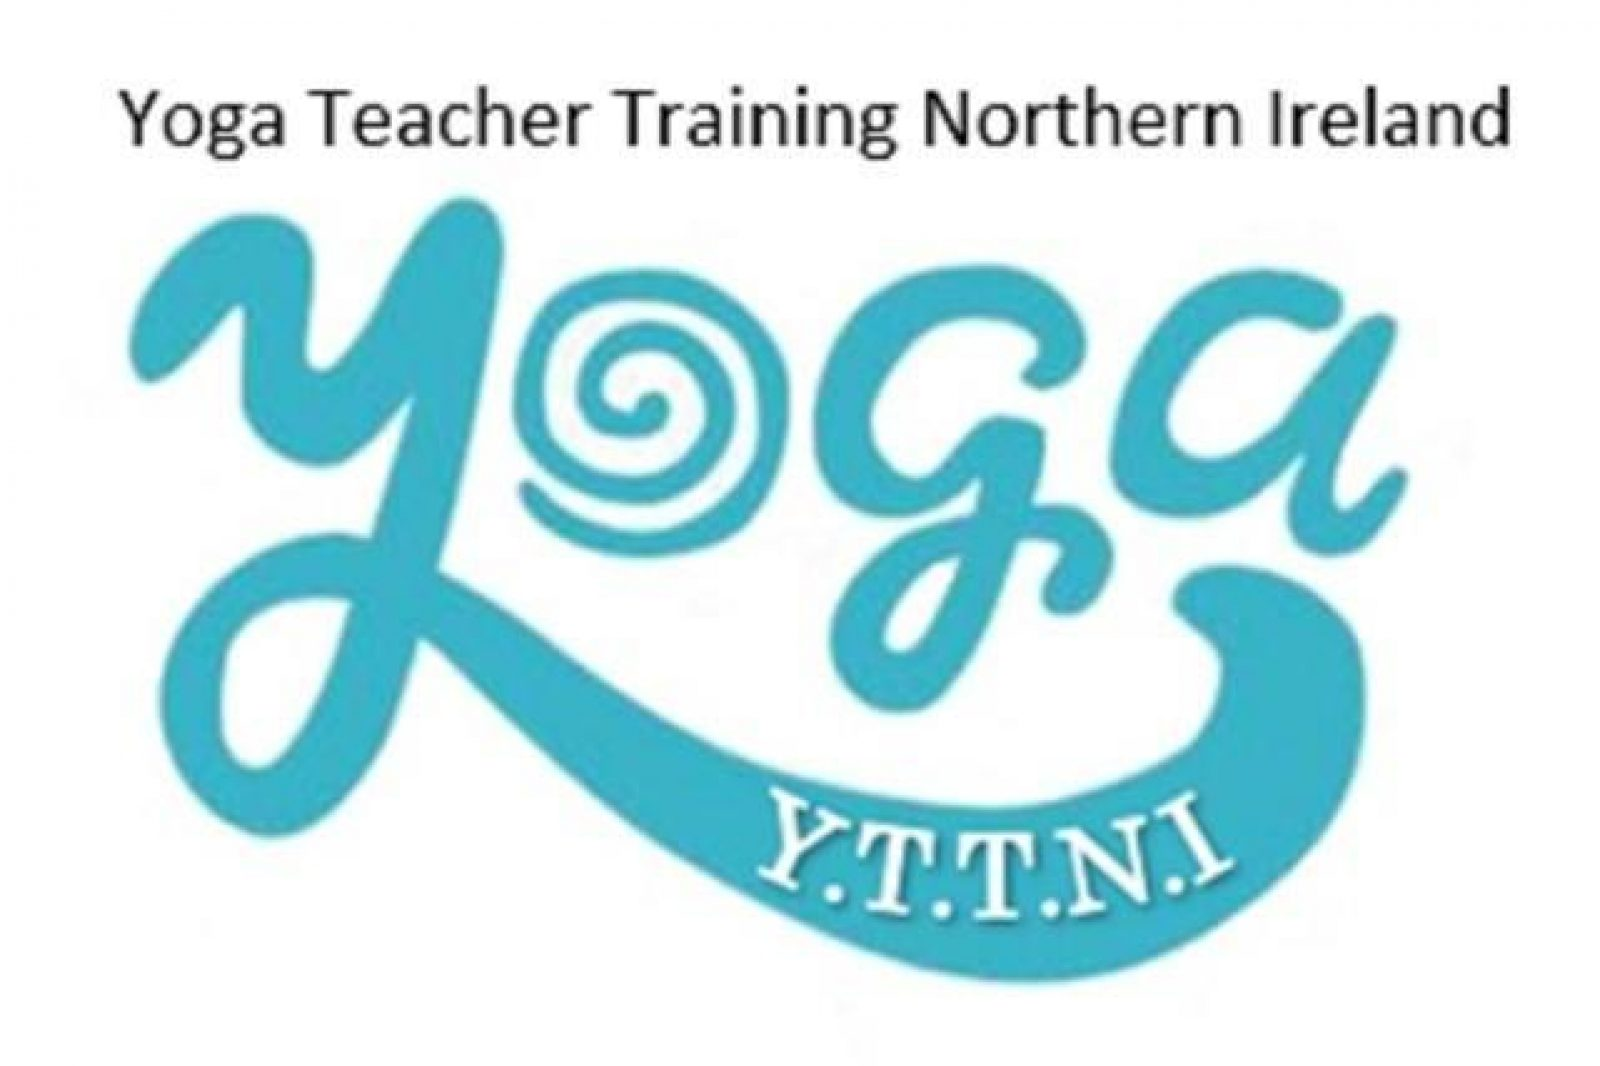 Yoga Teacher Training Borthern Ireland Logo